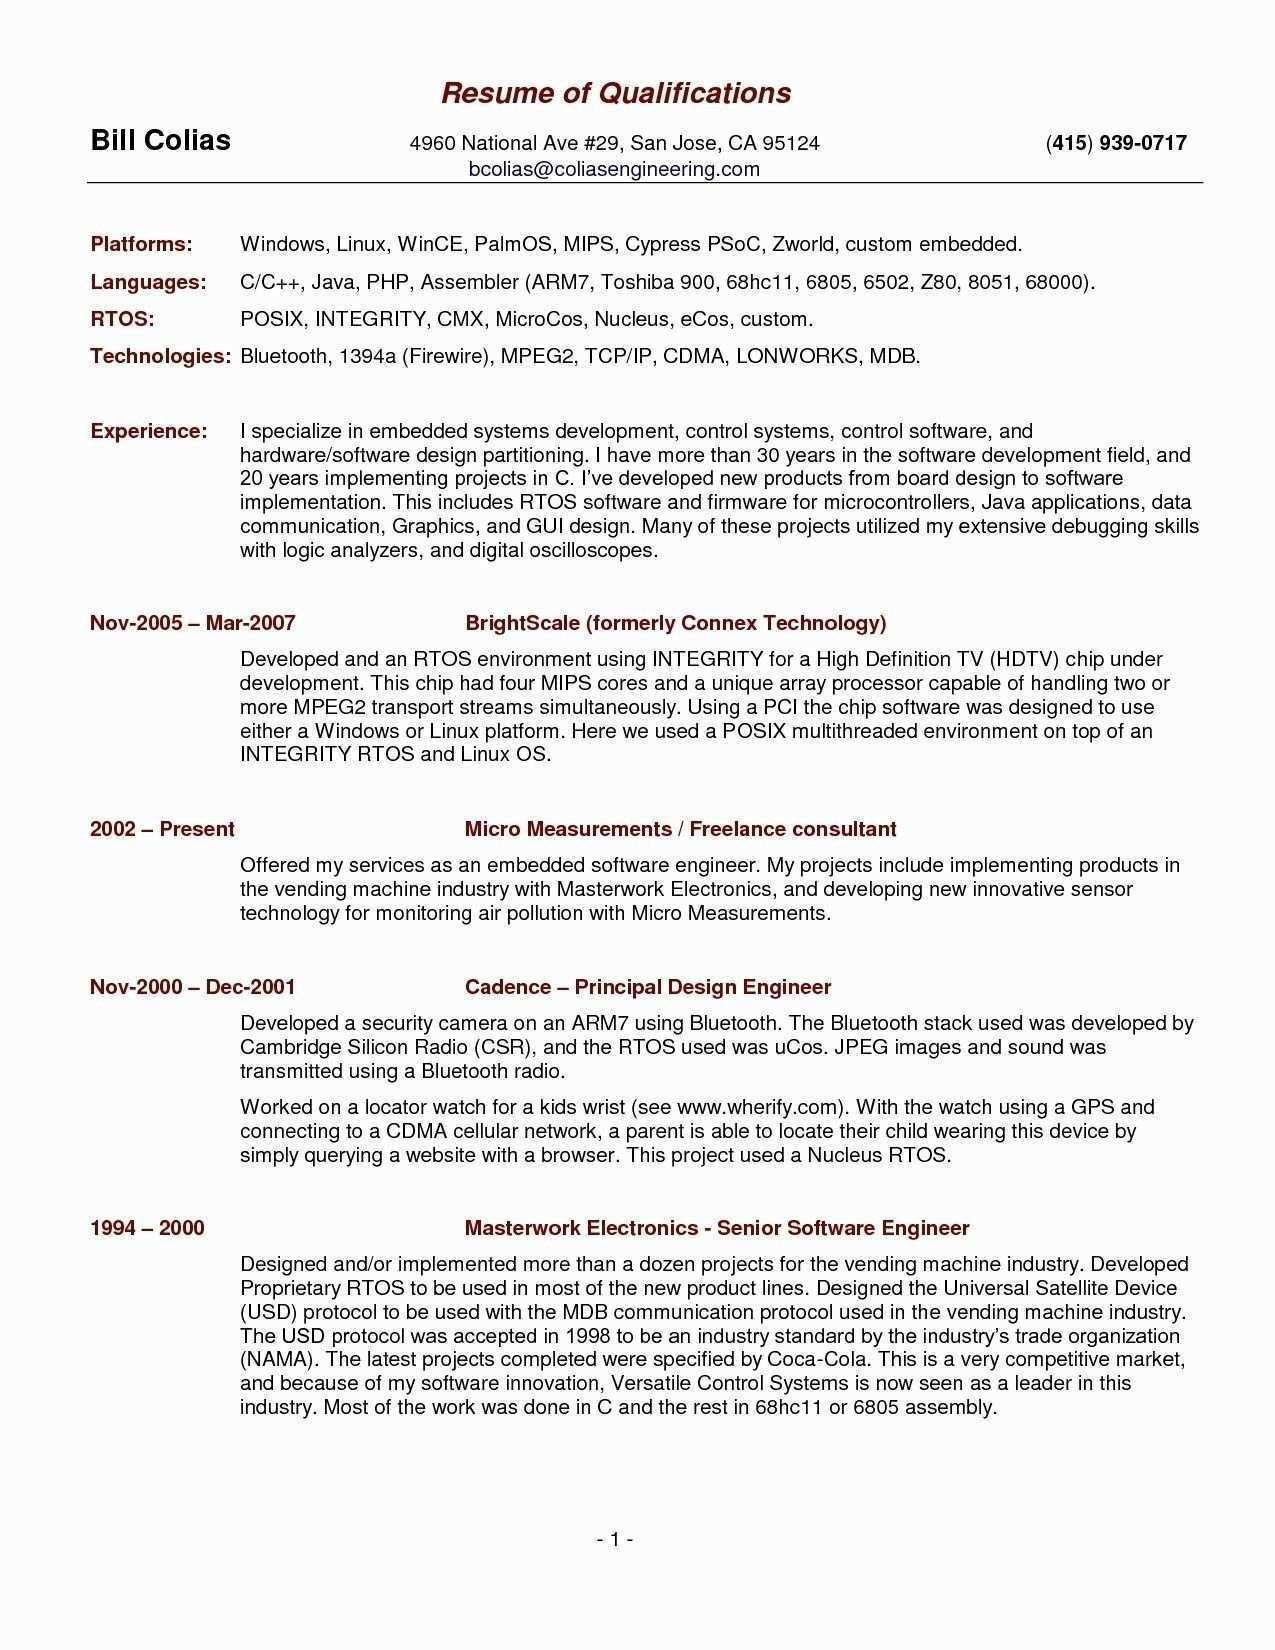 Nursing Poster Presentation Template Unique Powerpoint Resume Template Professional Resume Template Landscape Resume Template Basic Resume Resume